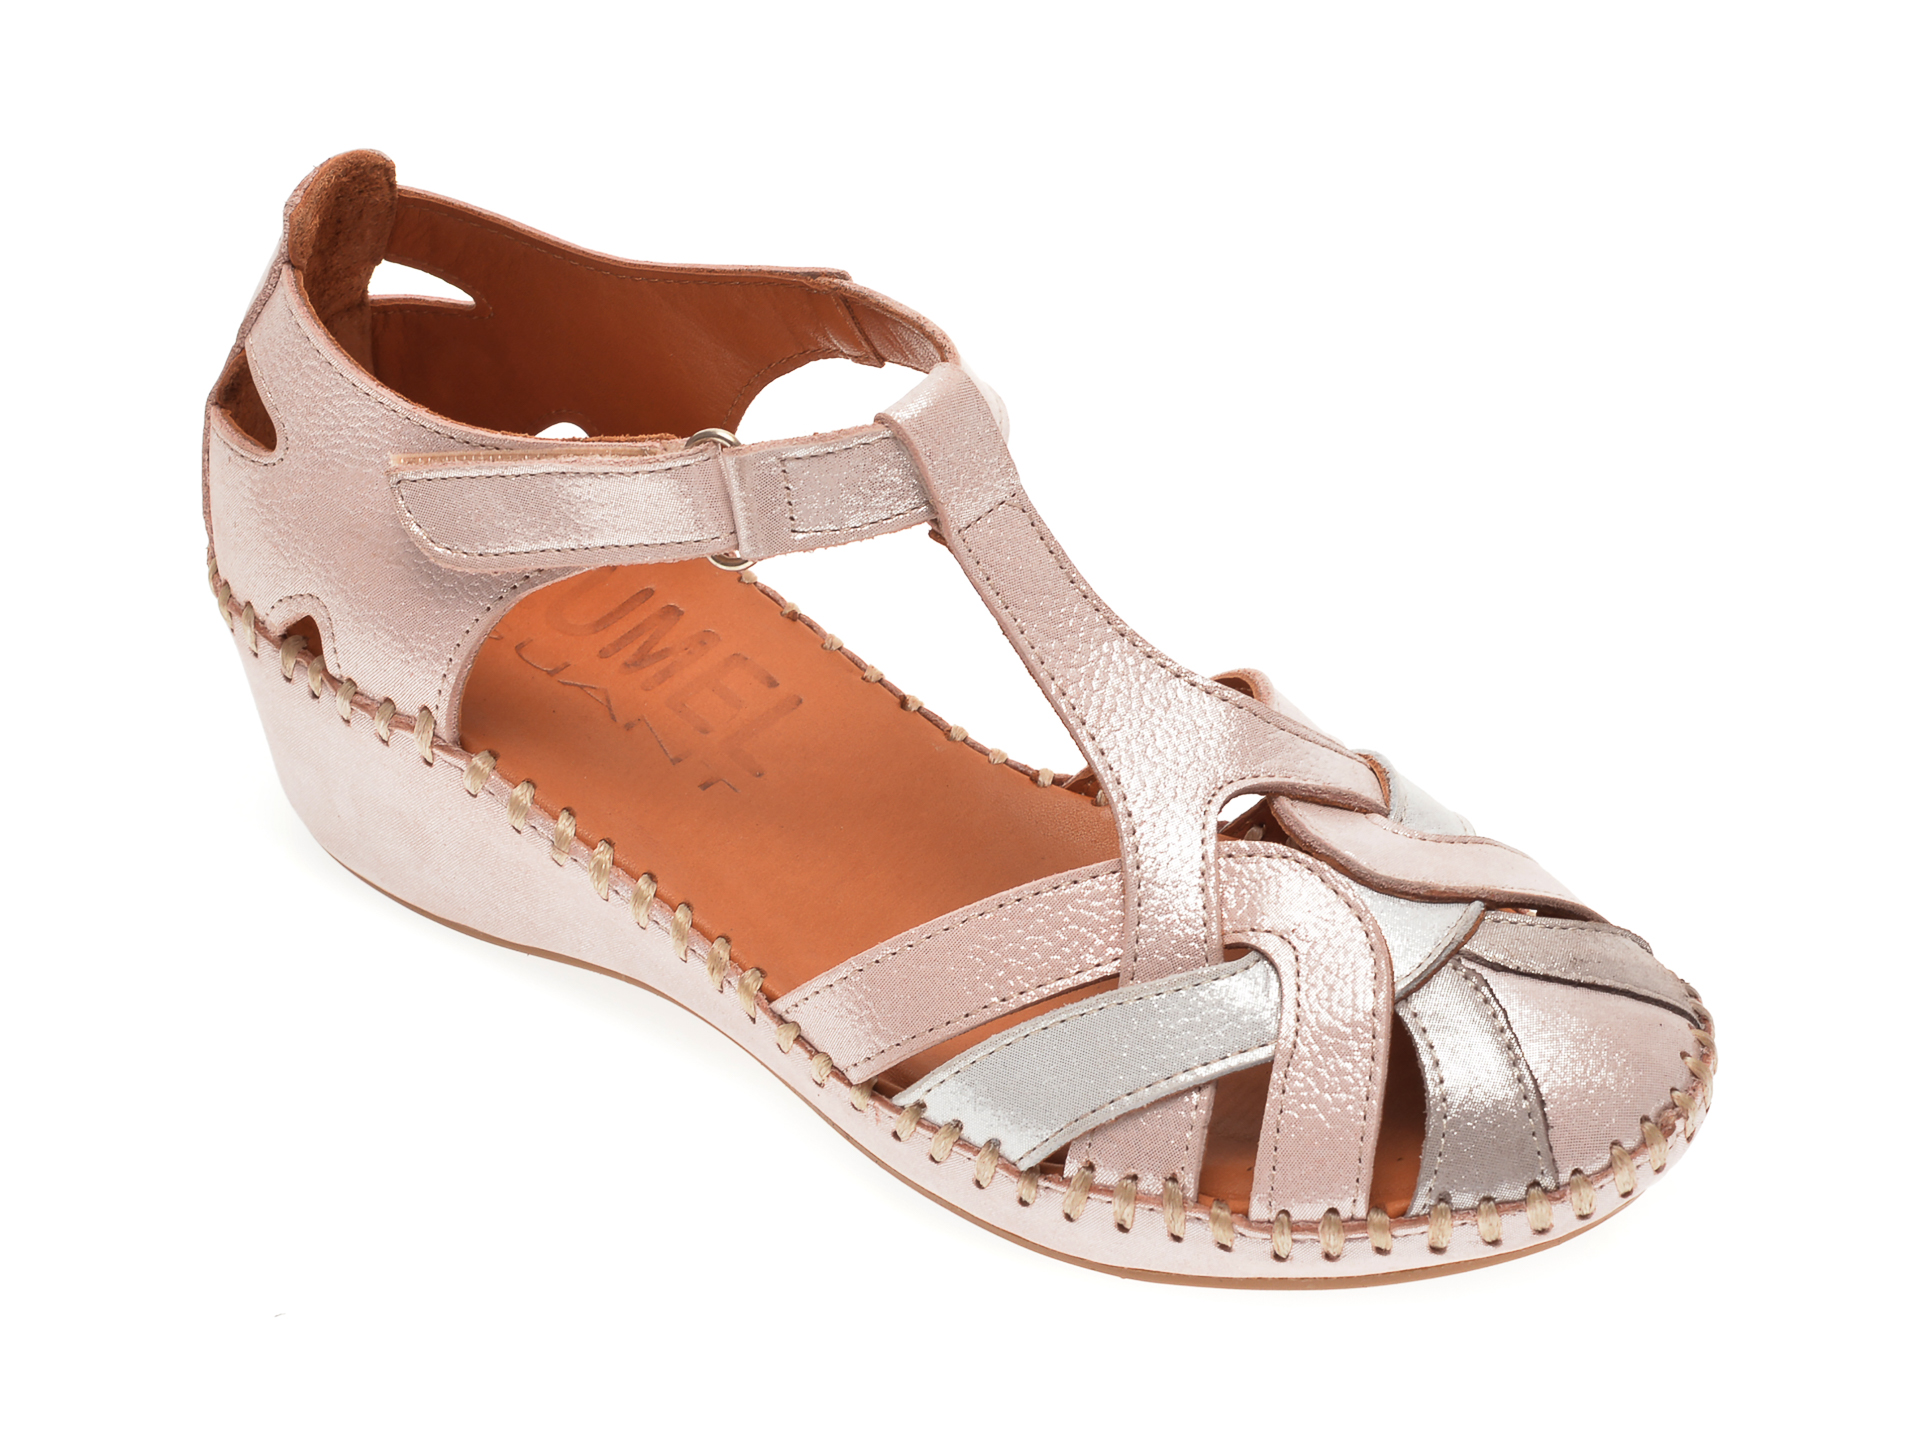 Sandale LUMEL roz, 101025, din piele naturala